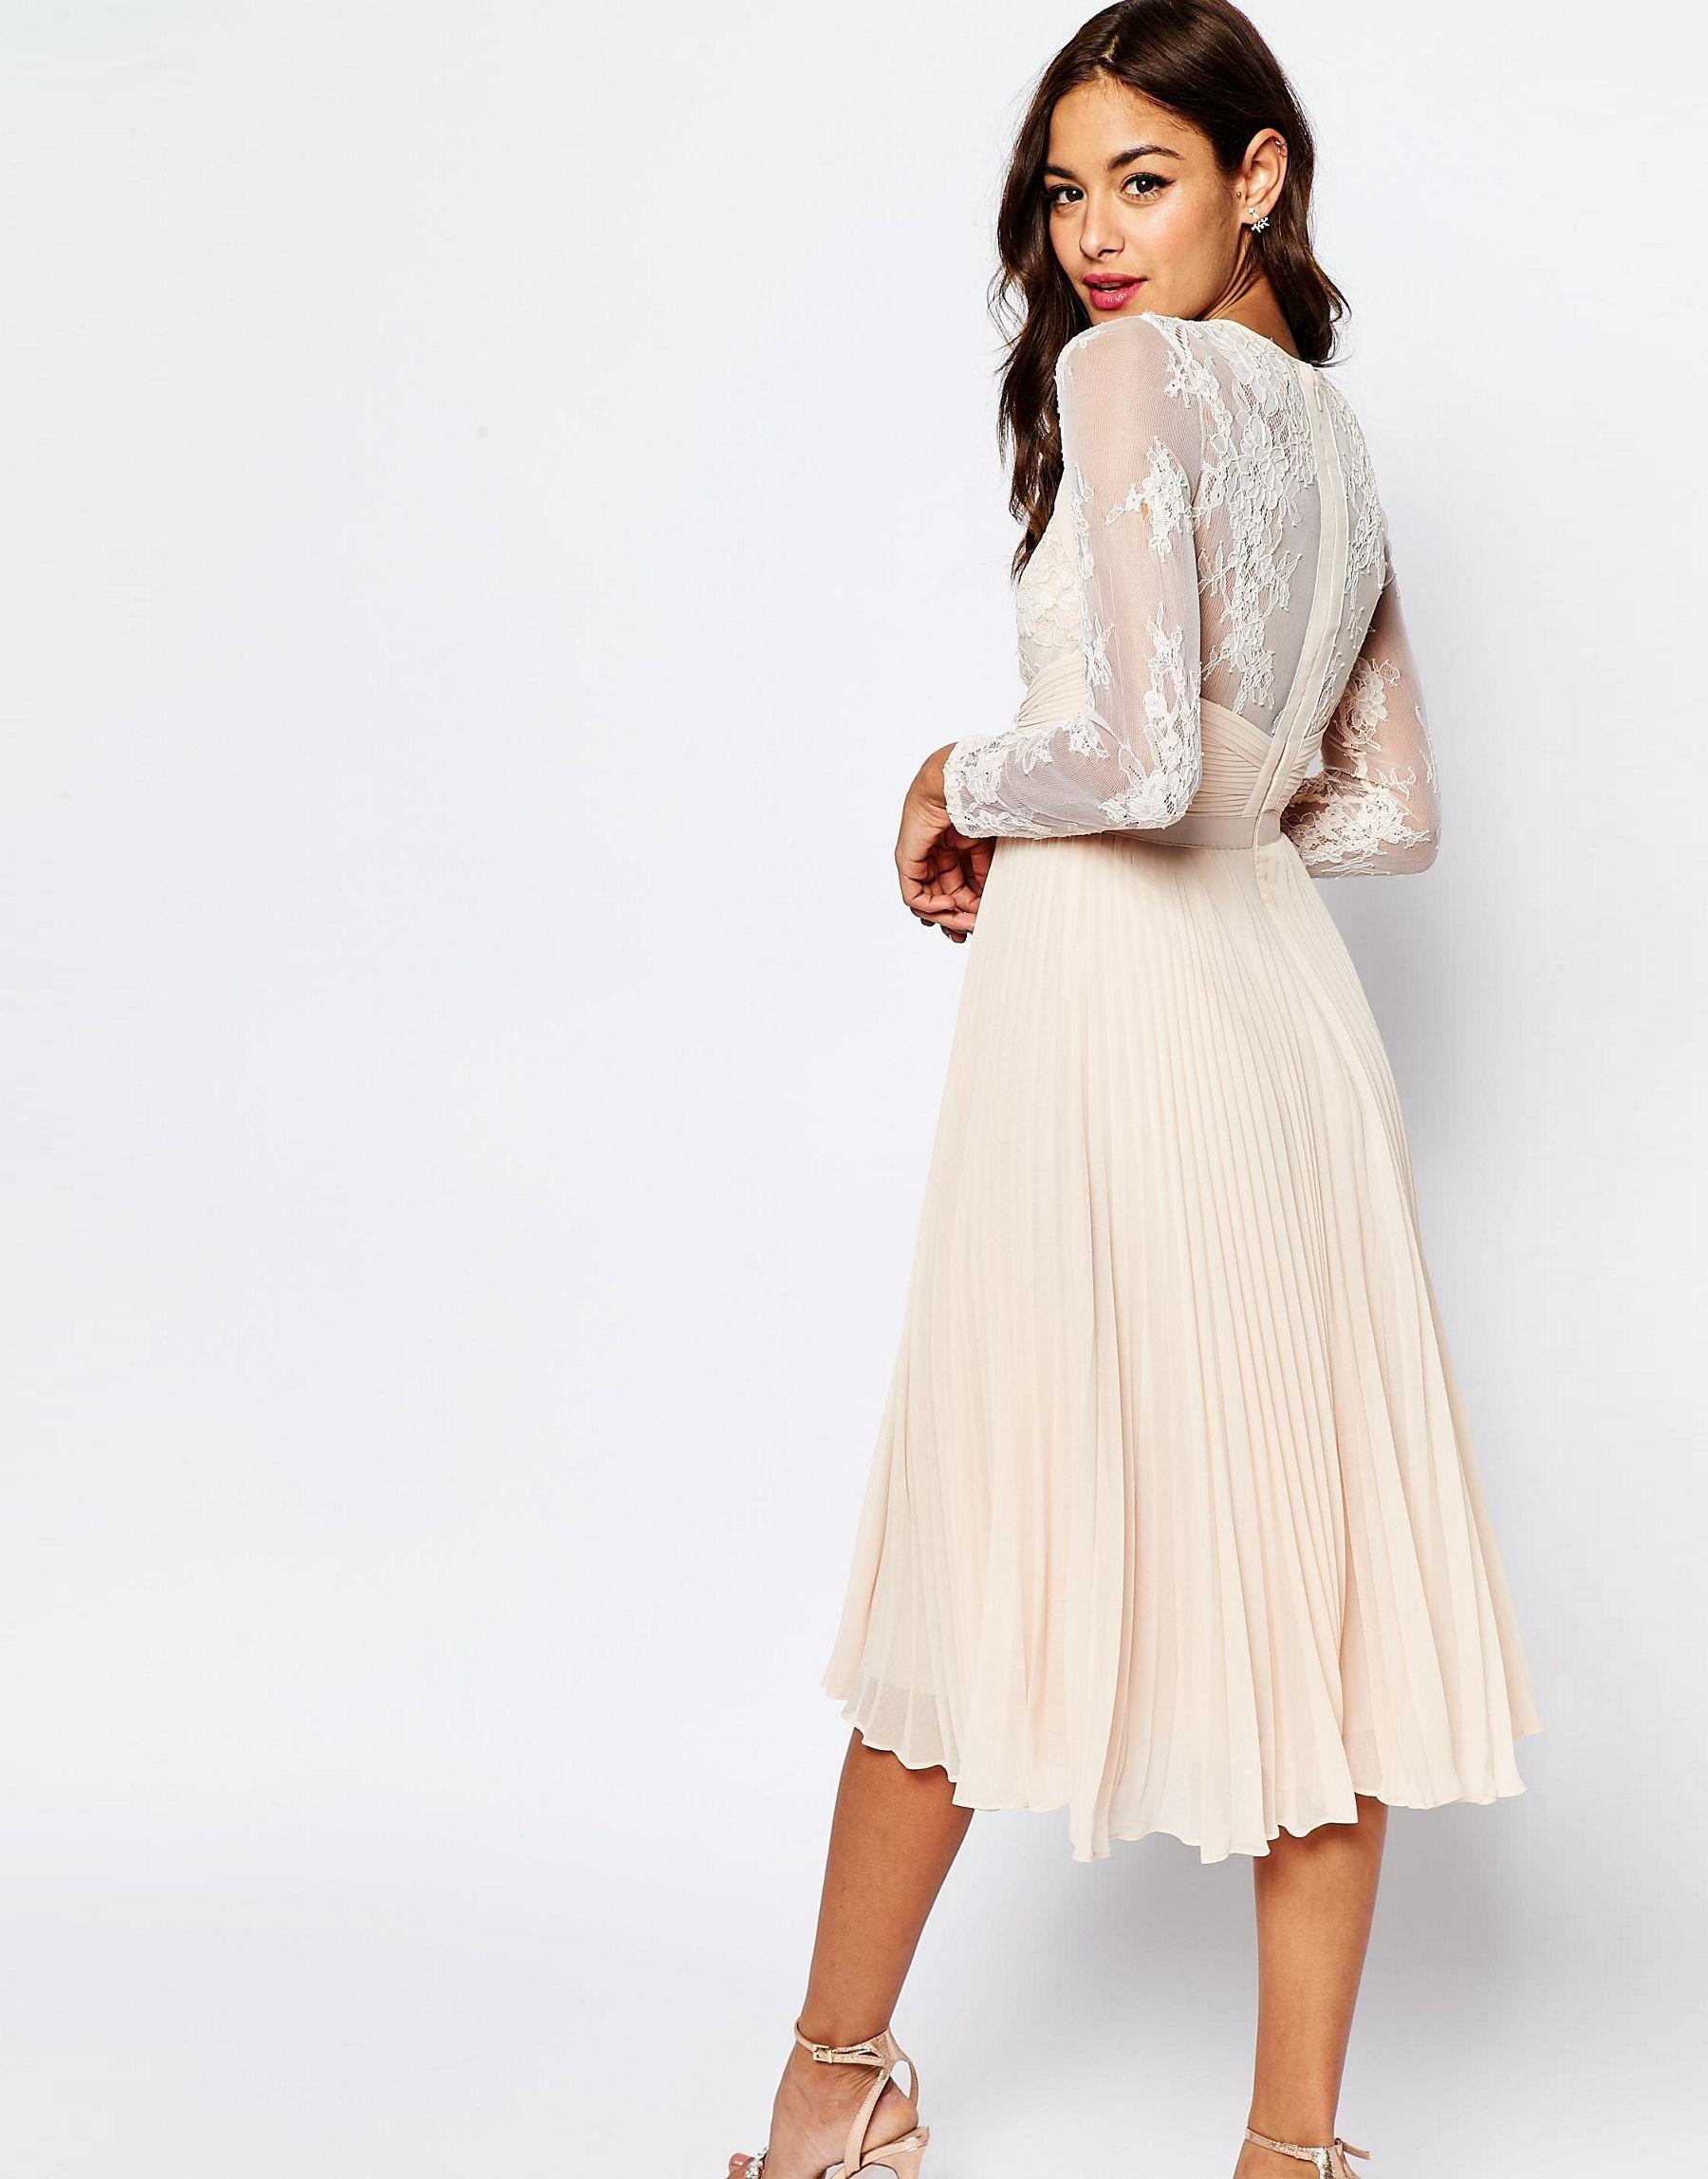 Lyst - Asos Petite Wedding Pretty Eyelash Pleated Skater Dress in White